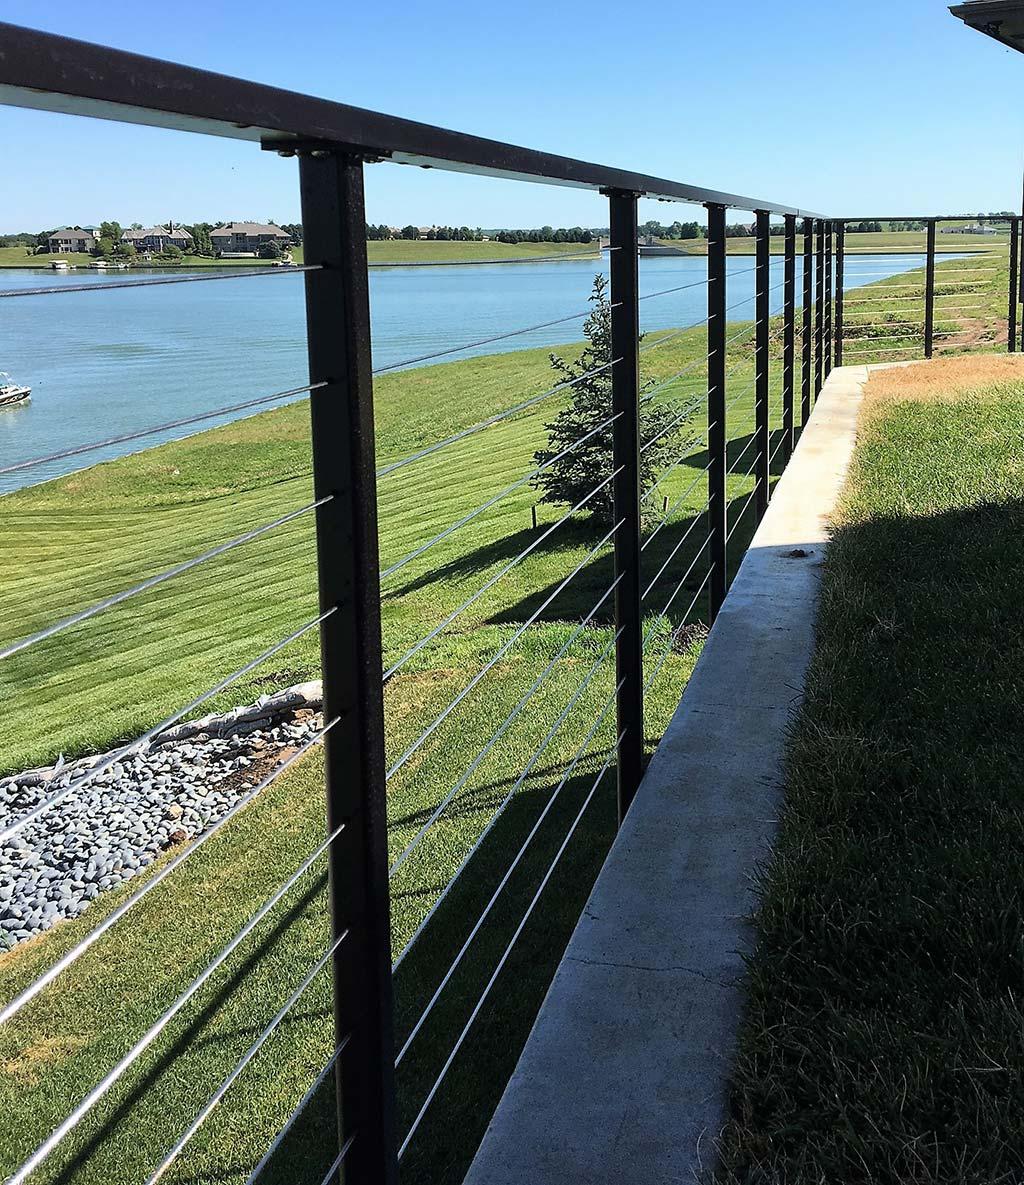 Modern Deck Railings   Stainless Steel Cable Deck Railings